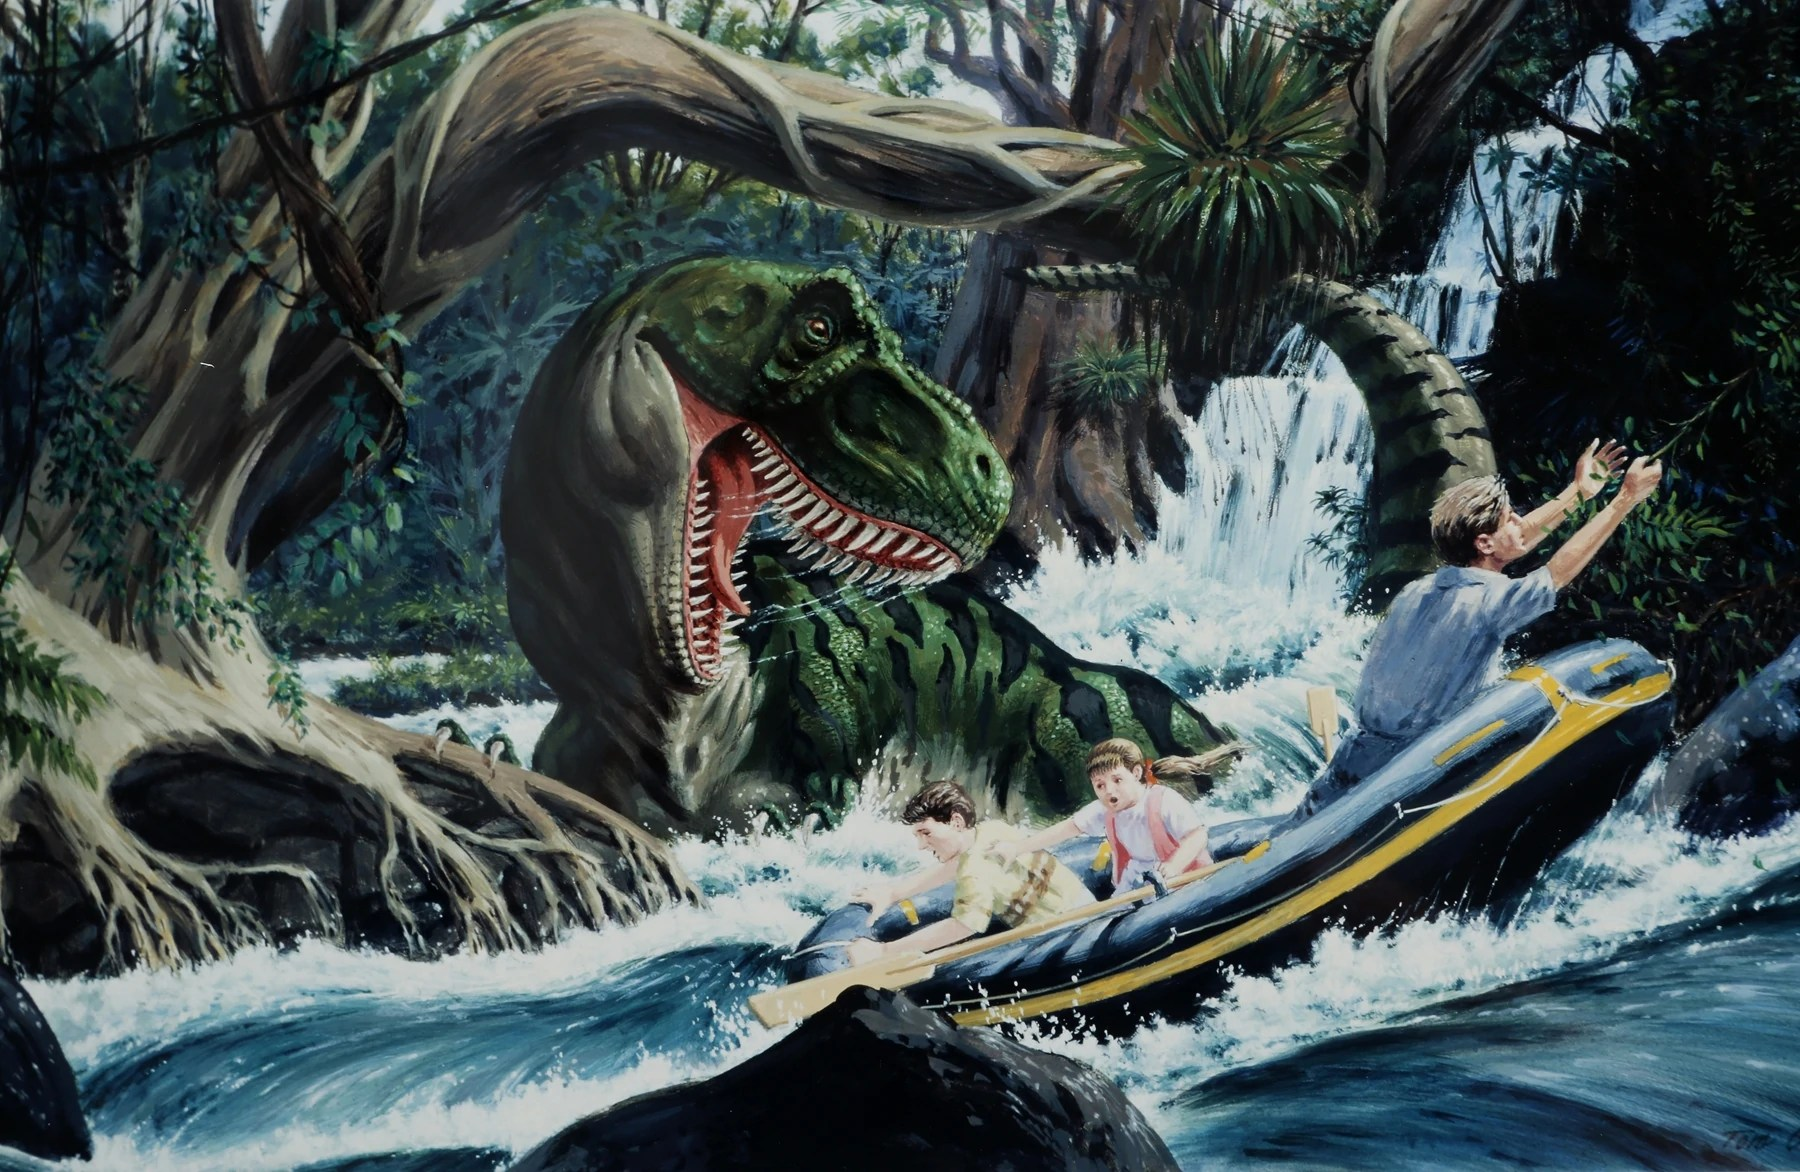 Abandoned Car In Swamp Wallpaper Tyrannosaurus Rex Novels Jurassic Park Wiki Fandom